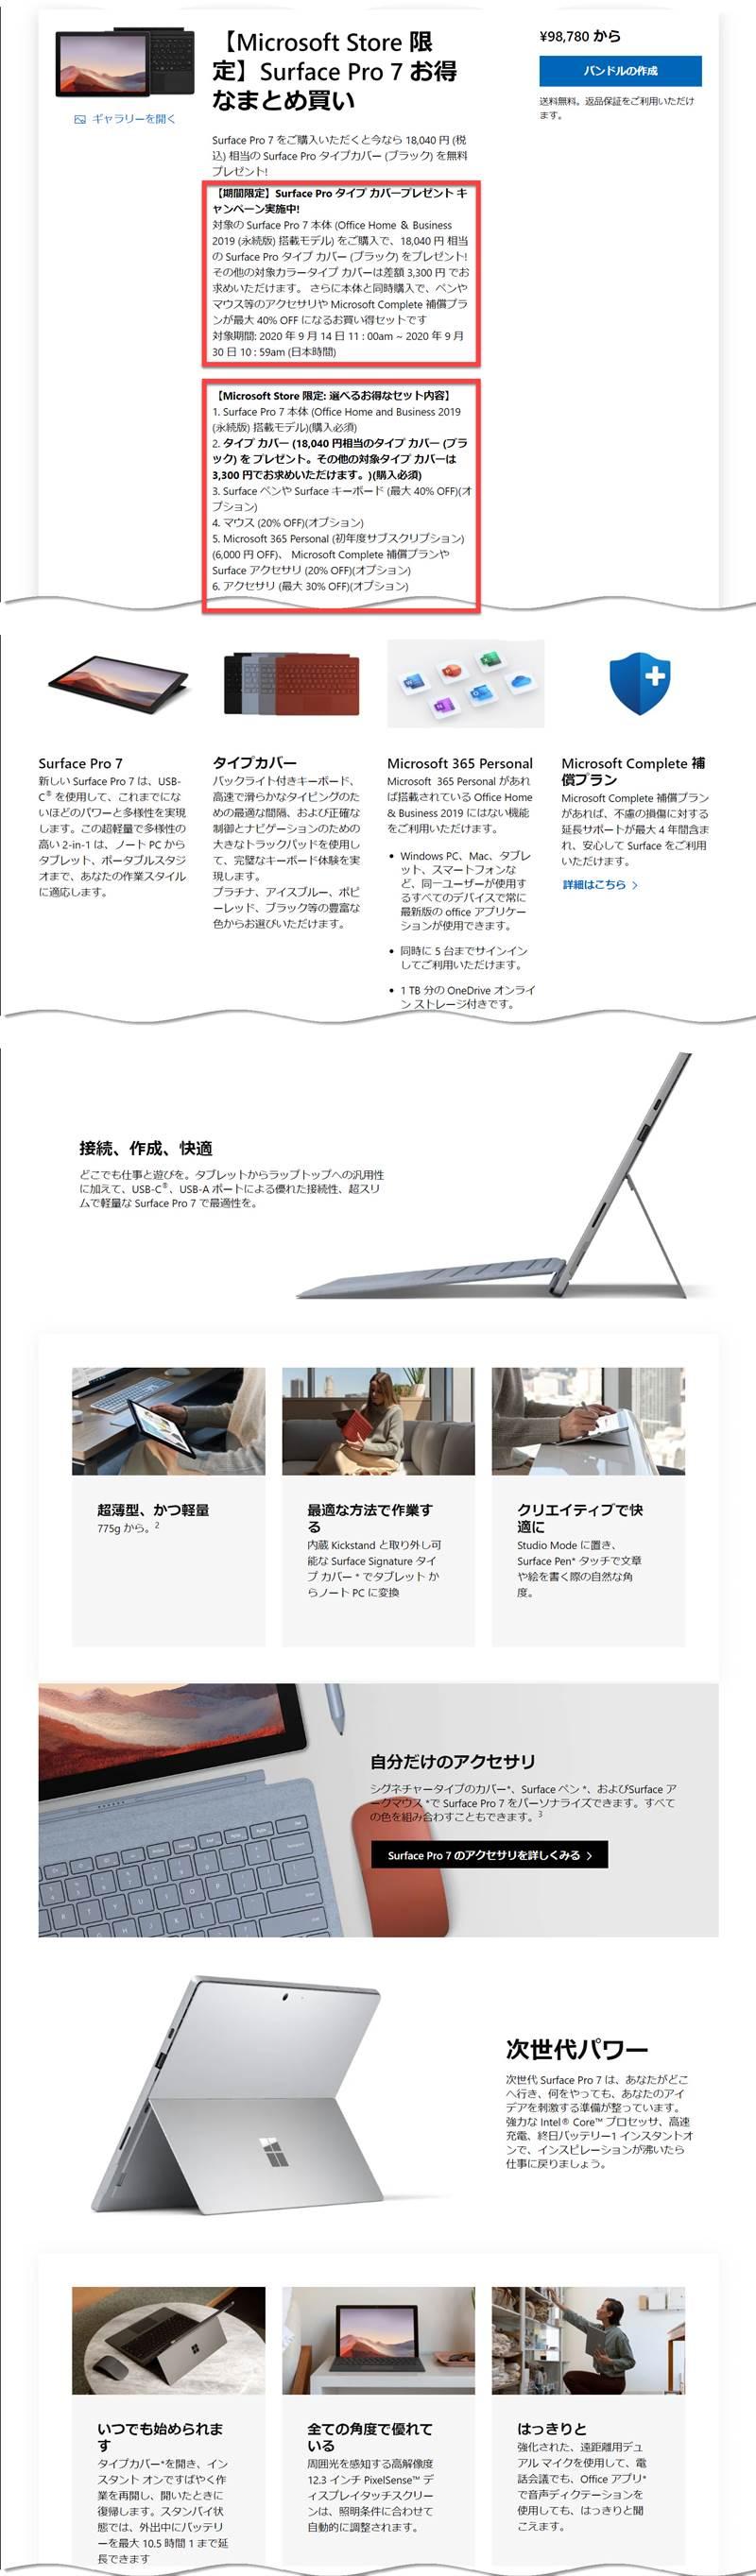 【Microsoft Store 限定】Surface Pro 7 お得なまとめ買い